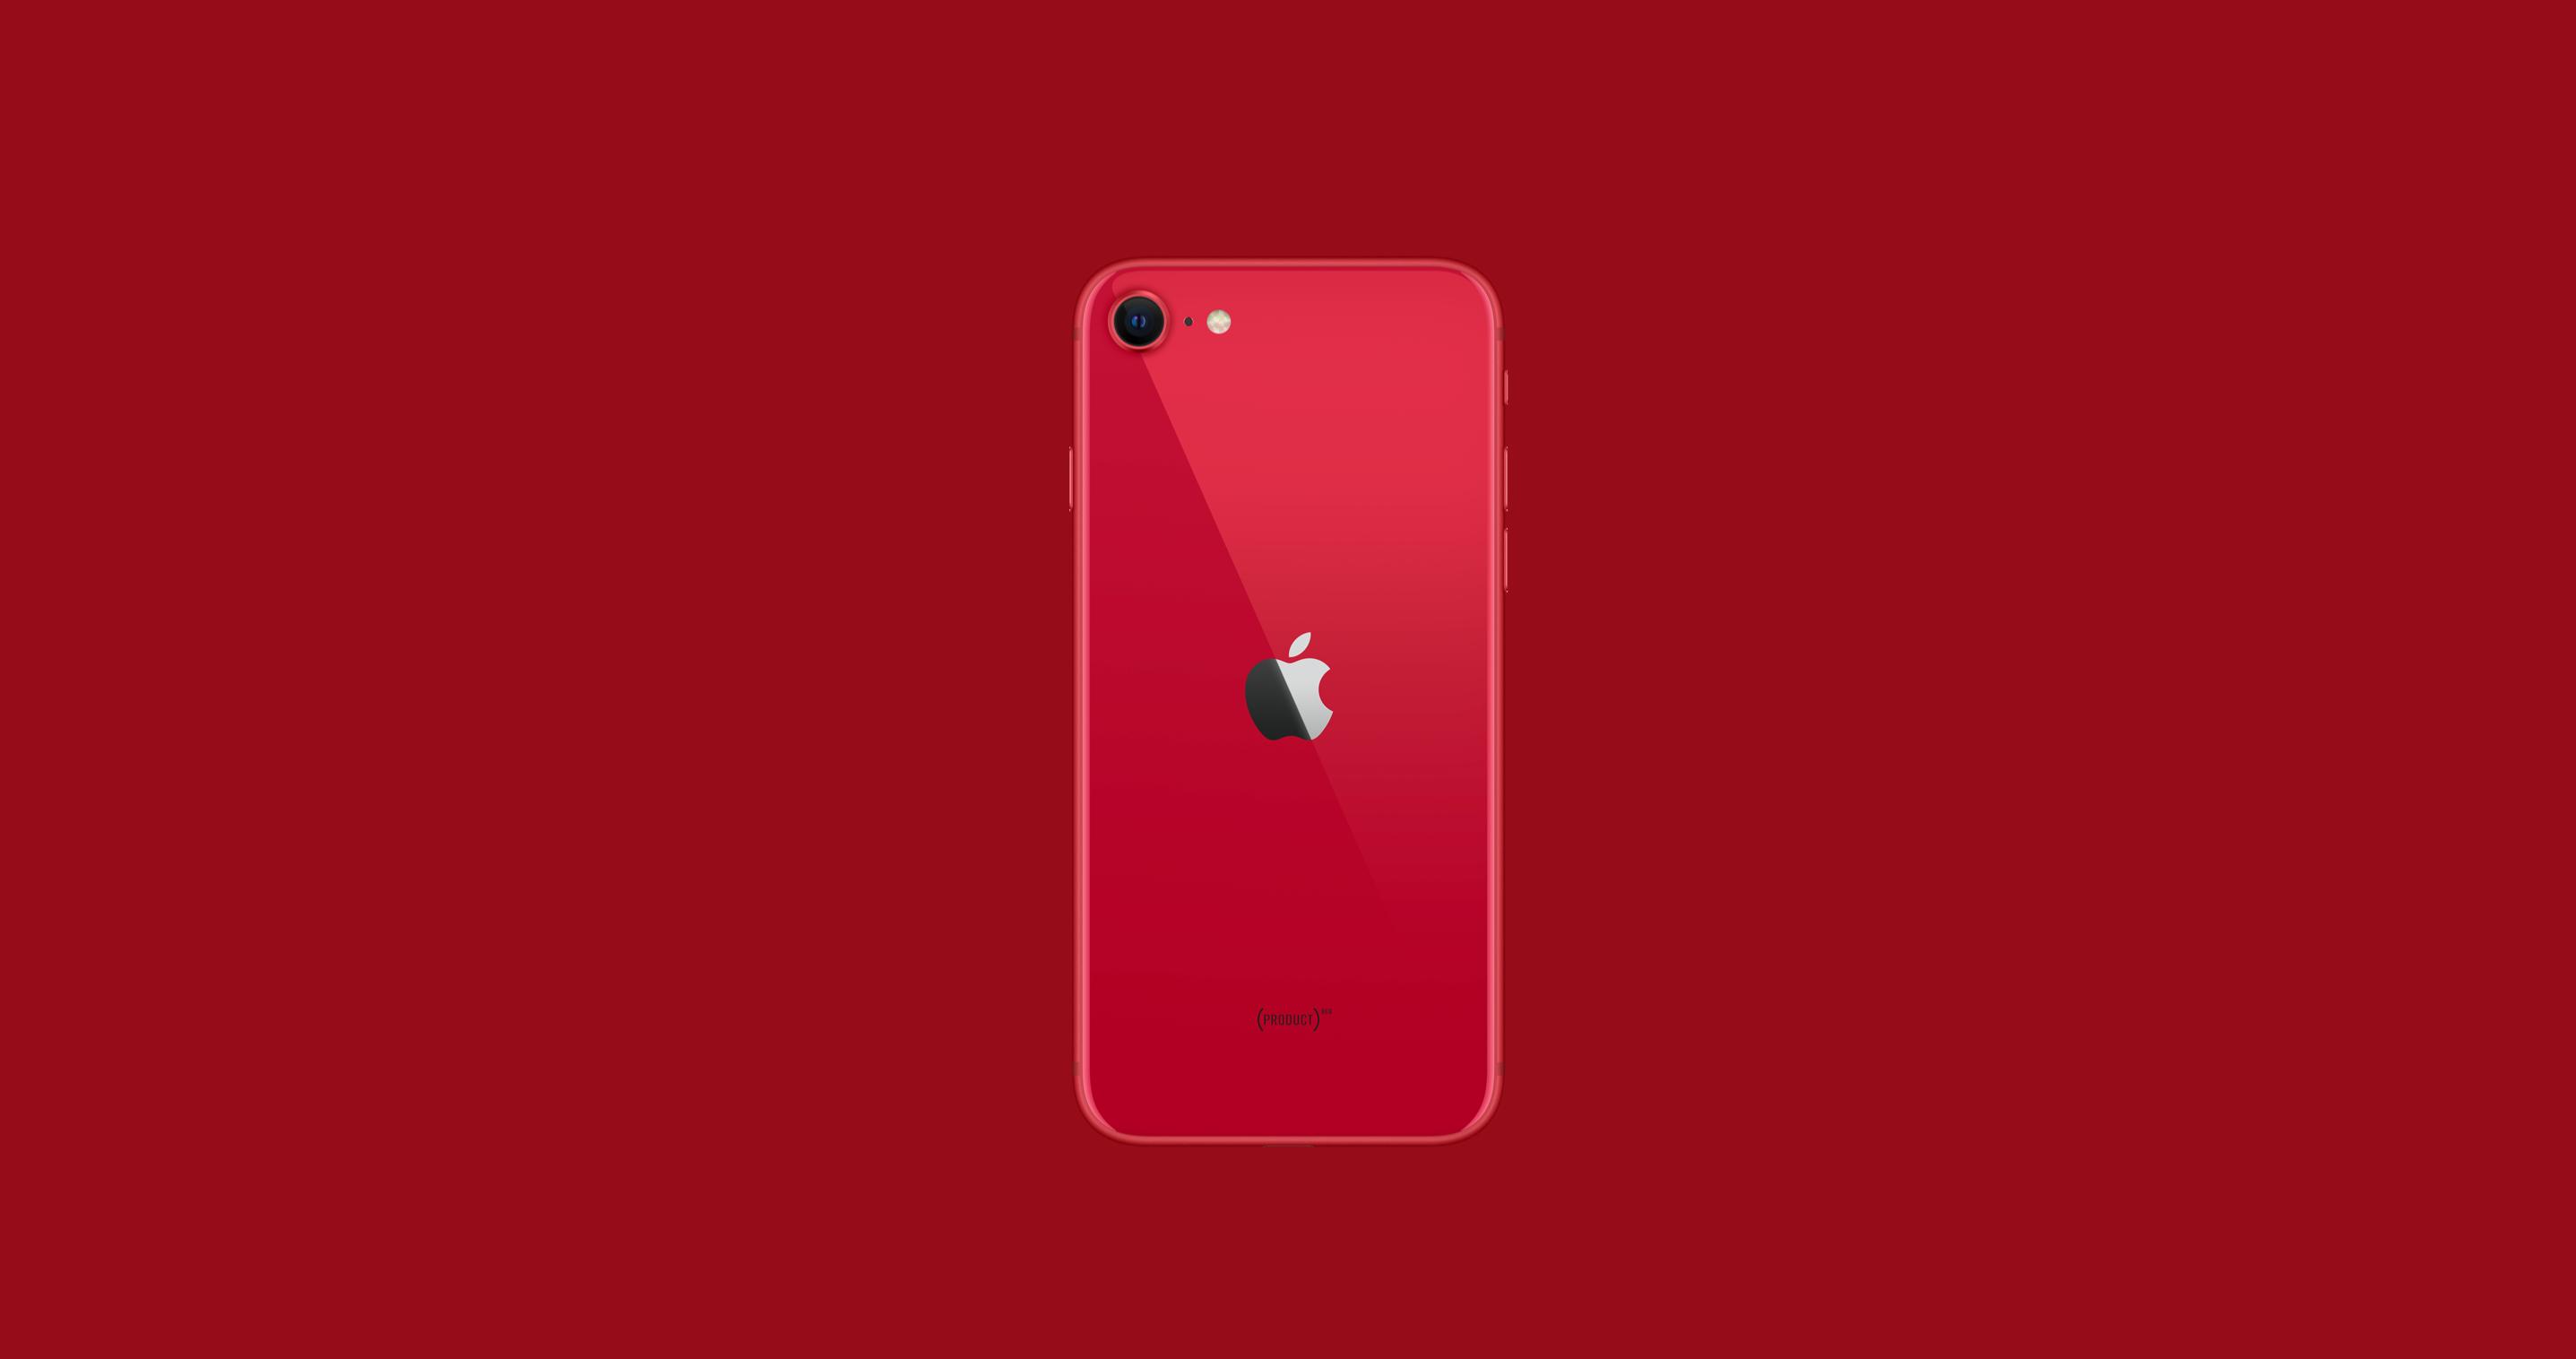 iPhone SE 2020 Dapat Skor DxOMark Yang Sama Seperti Pixel 3a